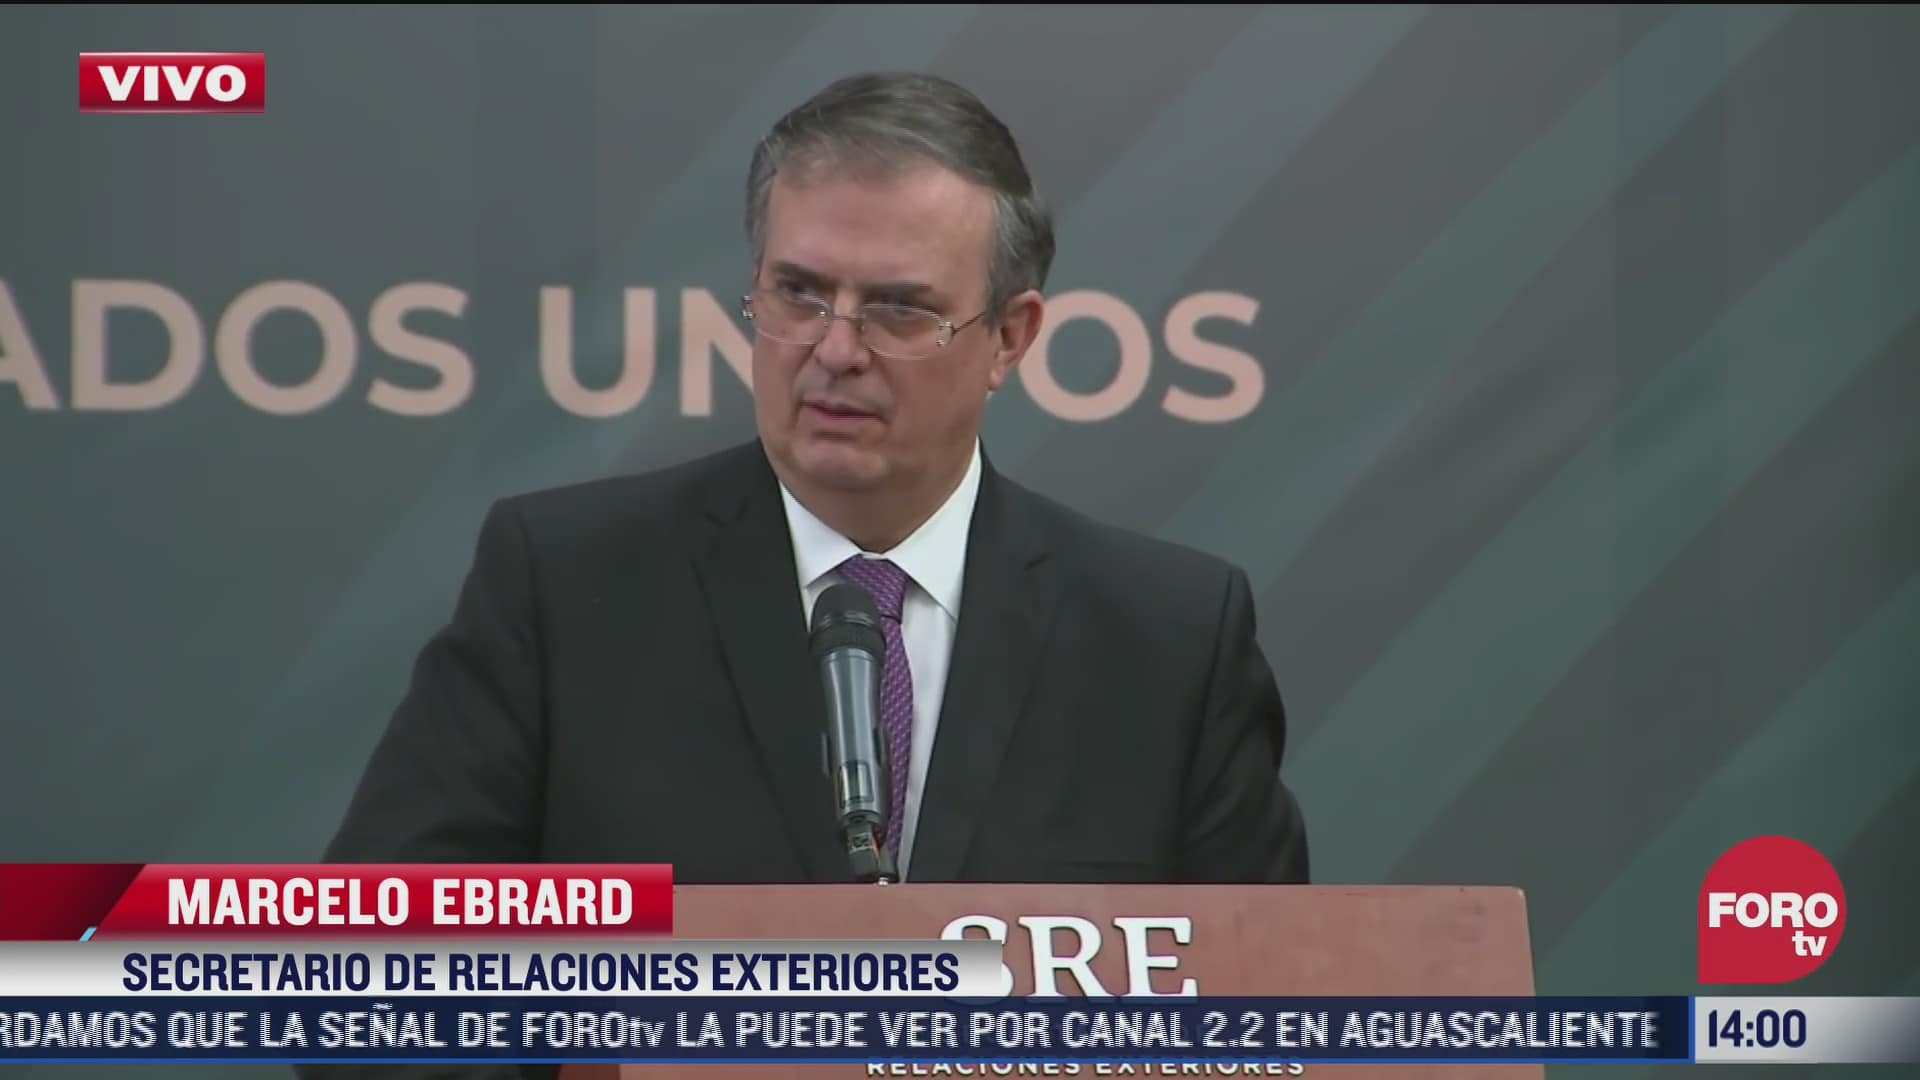 marcelo ebrard presenta acuerdos tras reunion con antony blinken